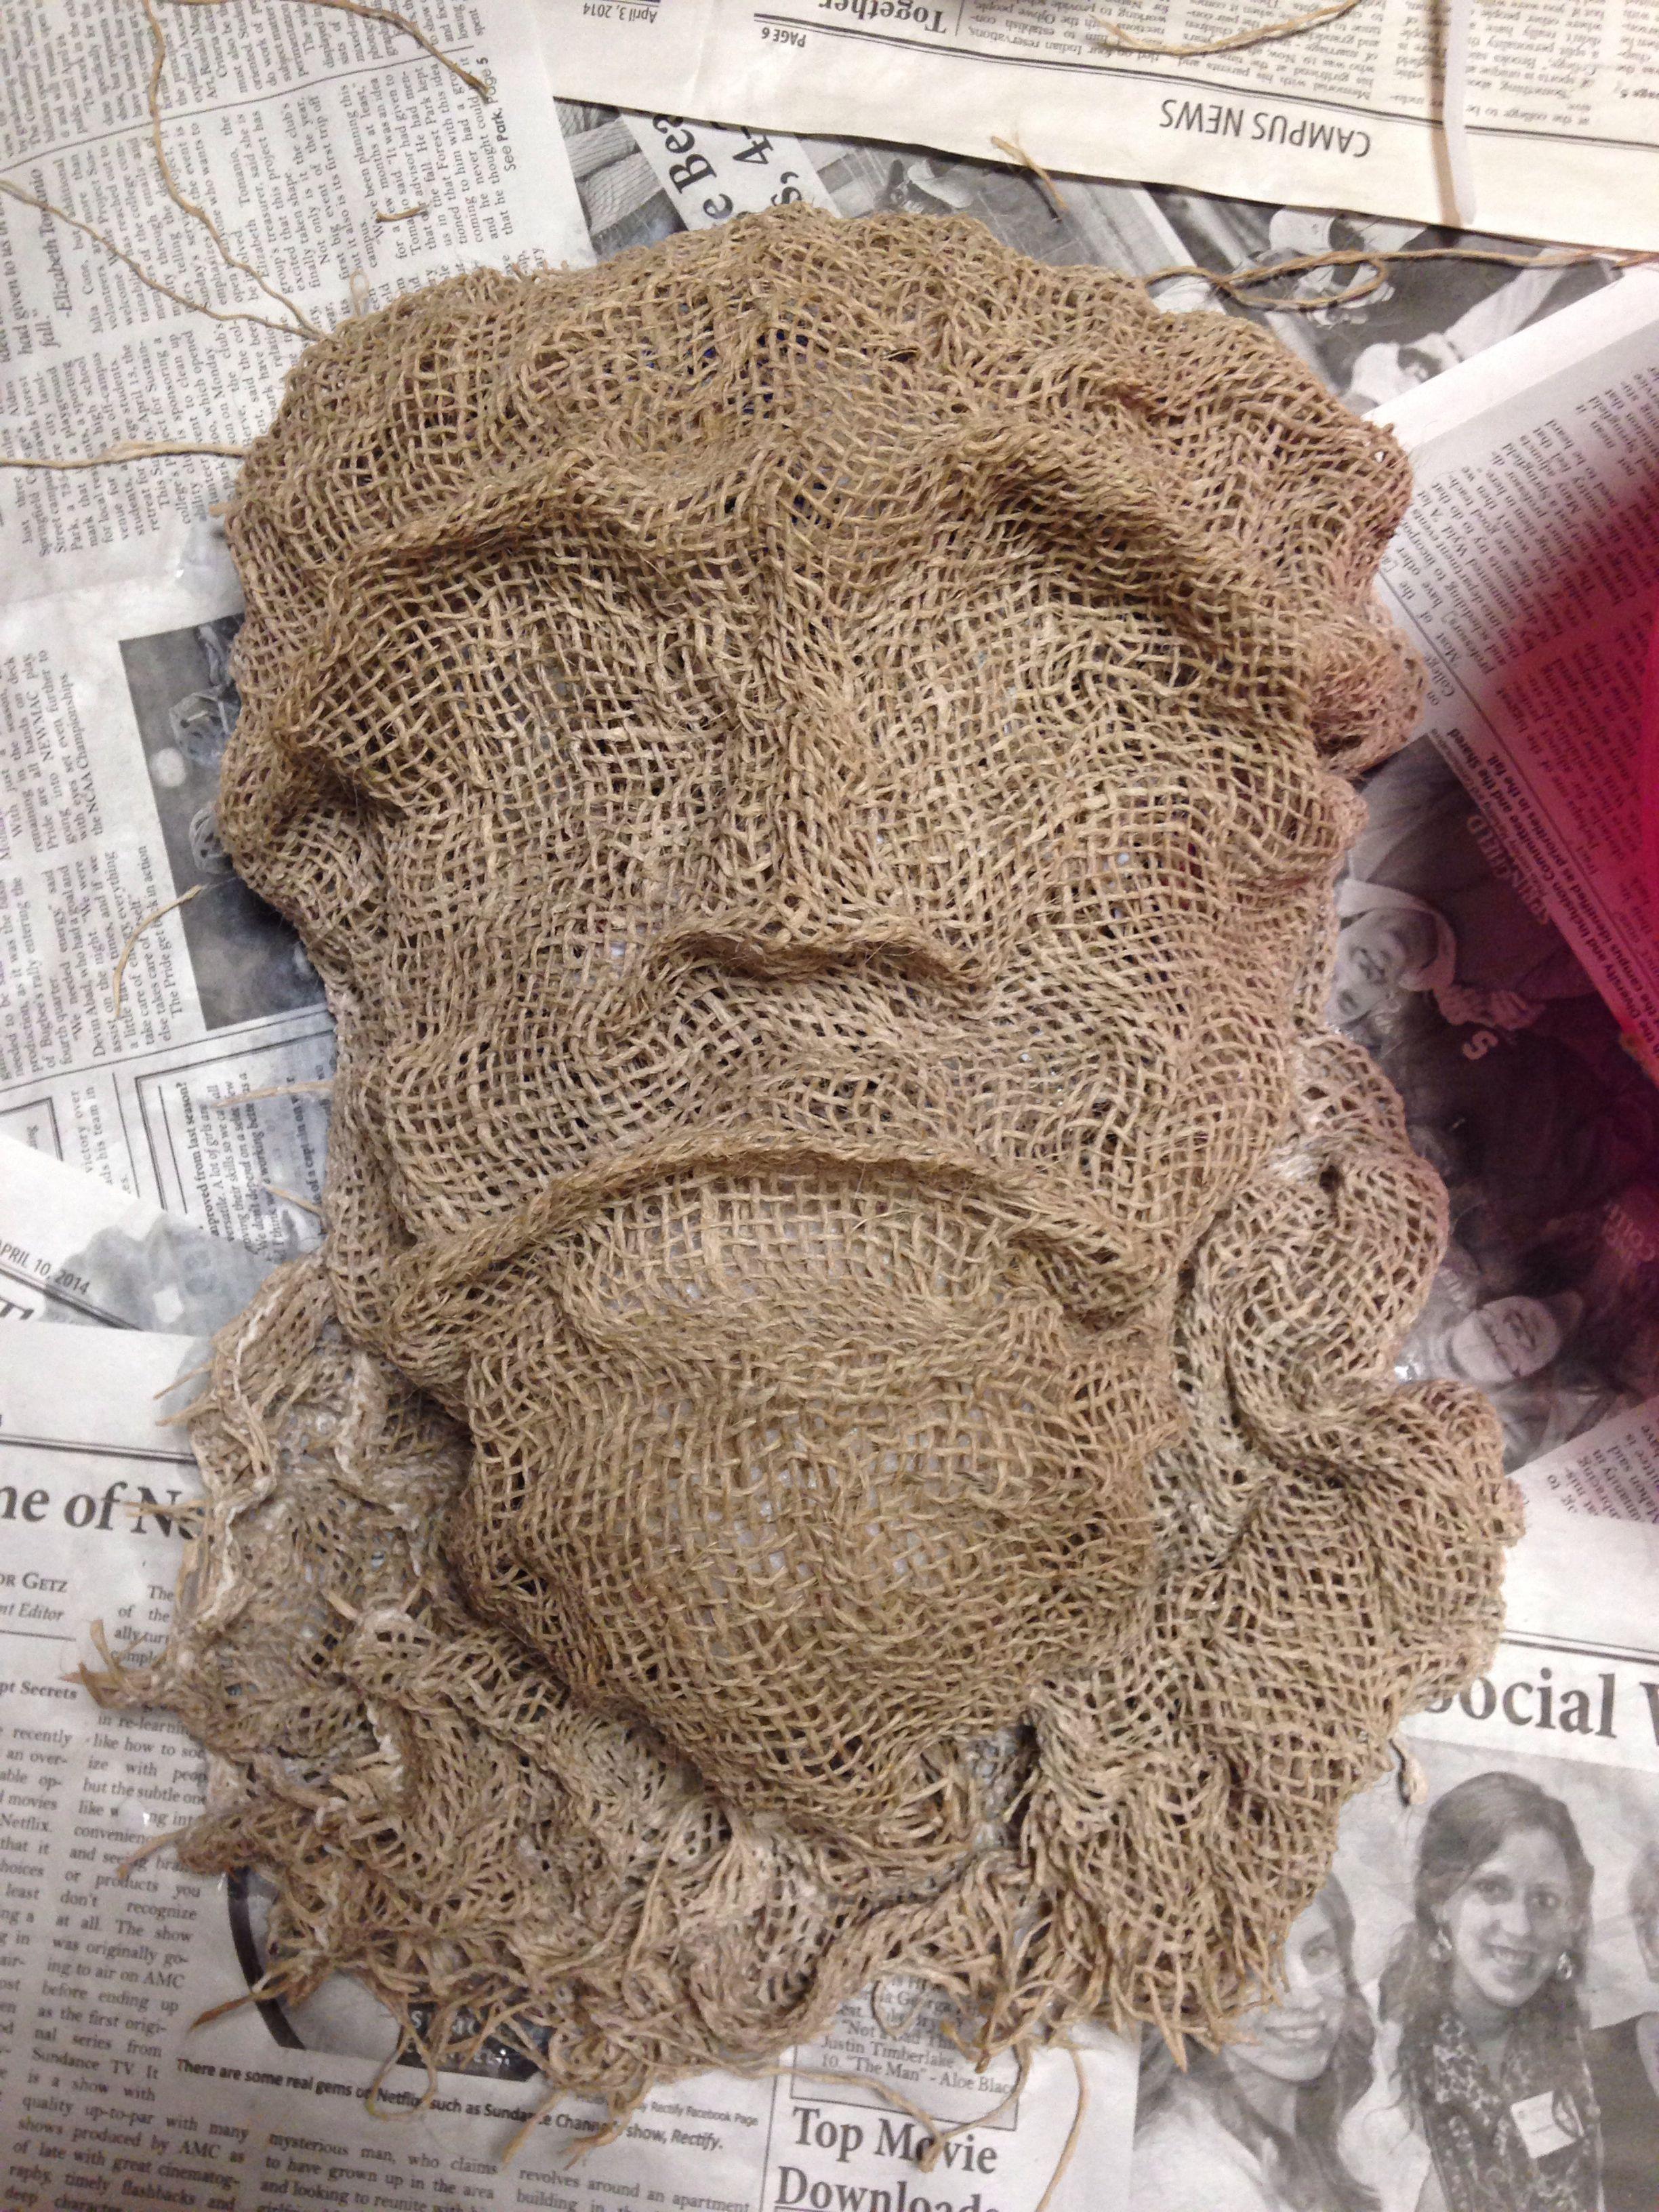 Mask made of burlap and glue/water!! Burlap halloween